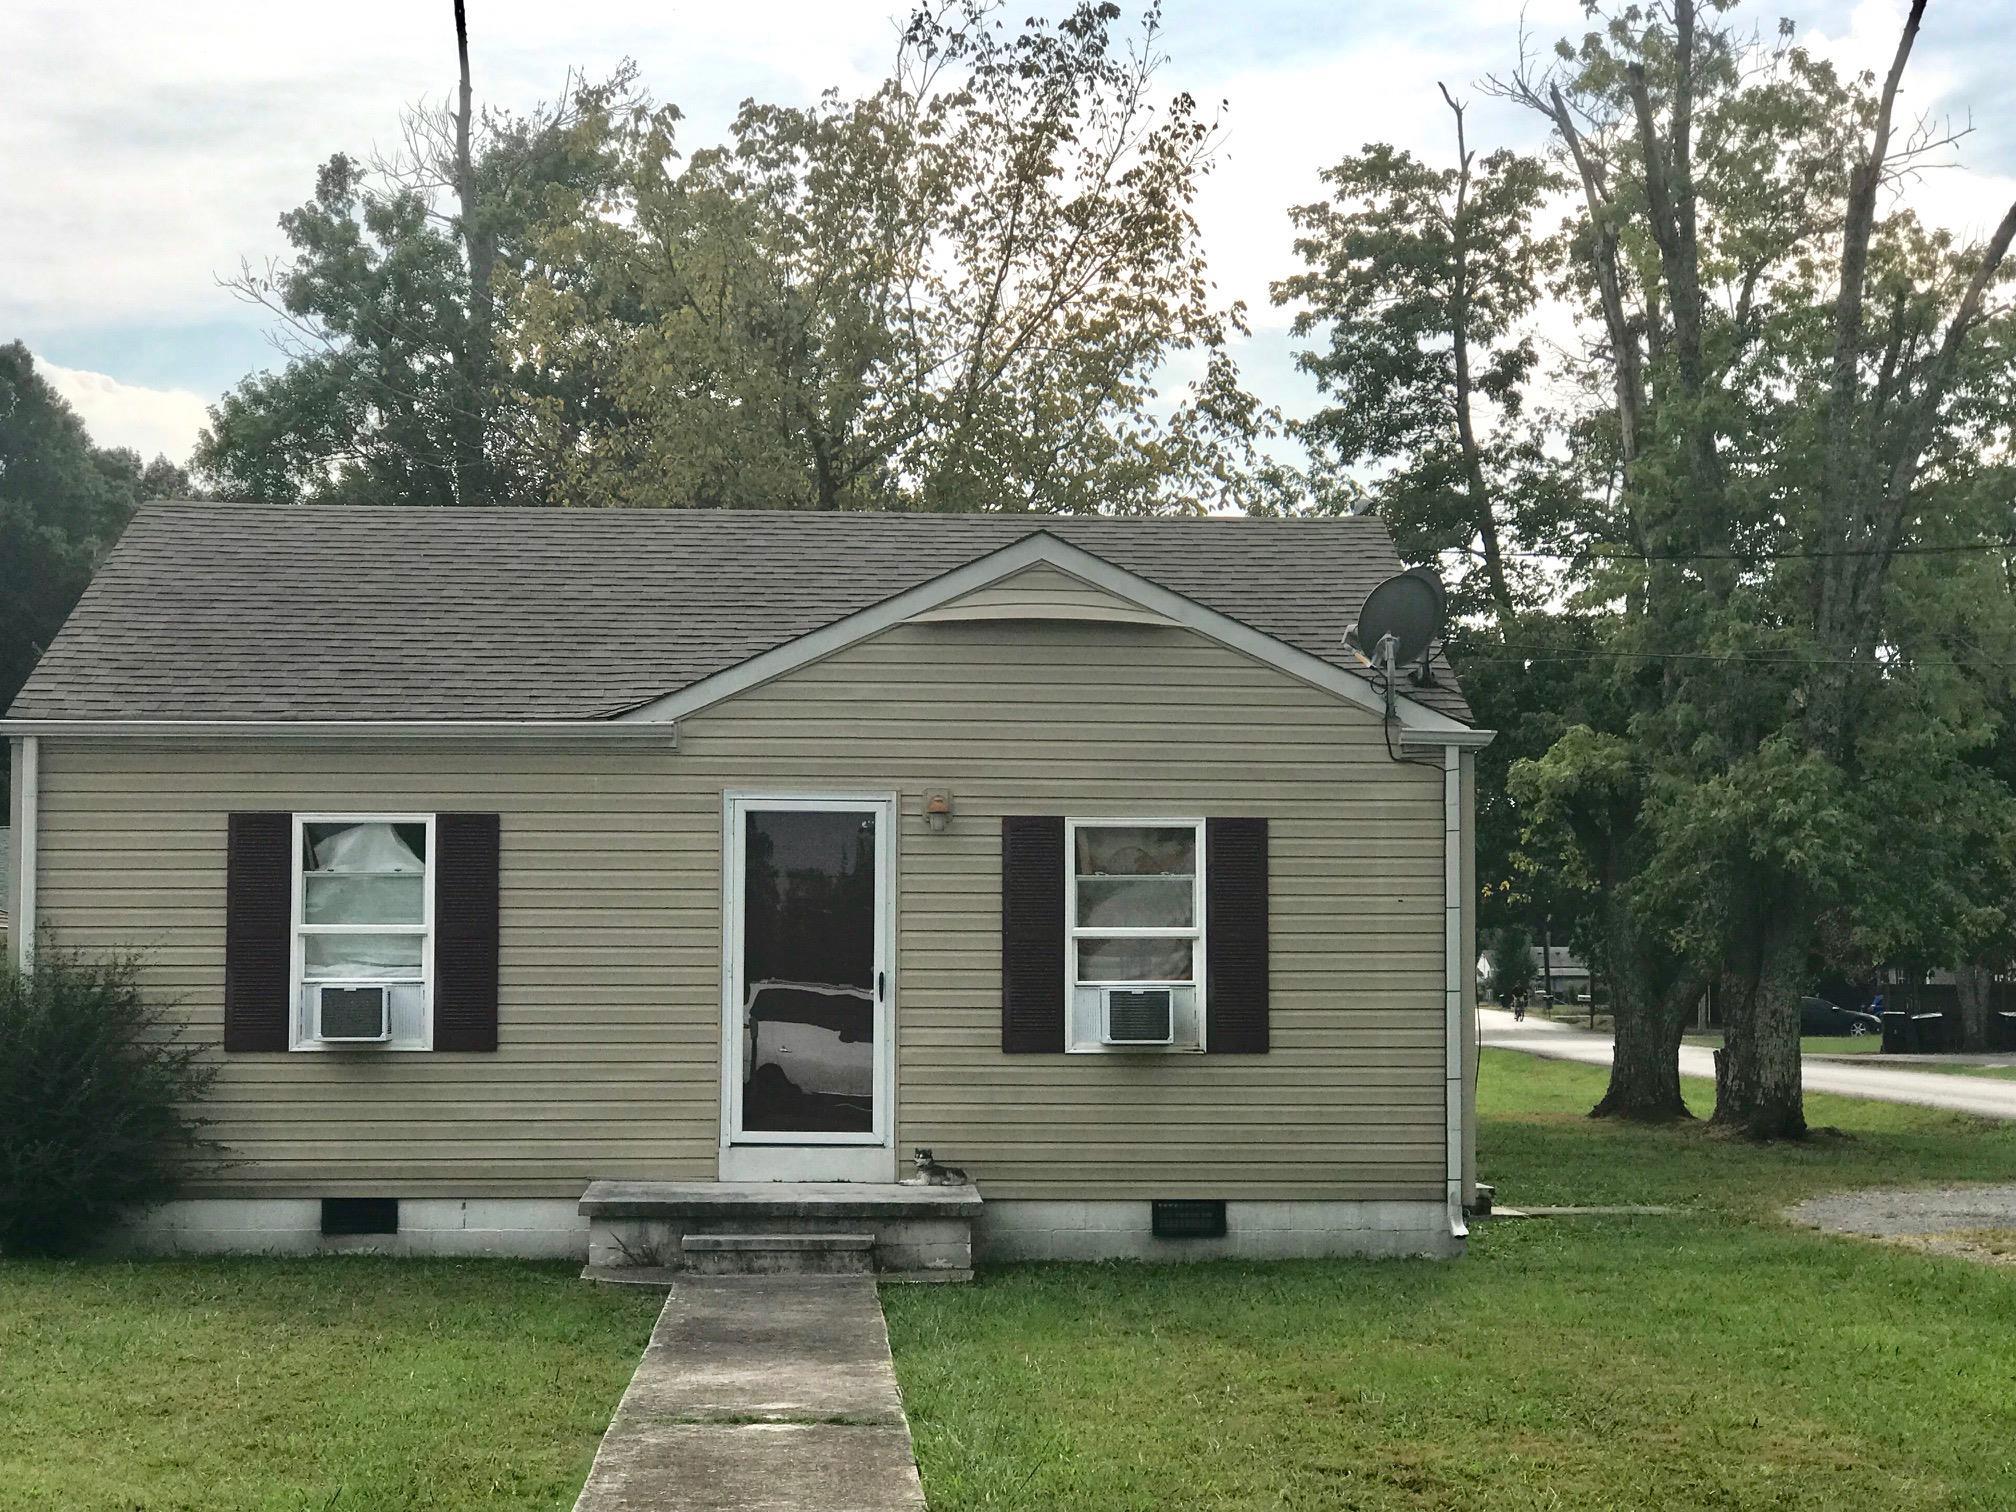 206S S. Roosevelt, Tullahoma, TN 37388 - Tullahoma, TN real estate listing